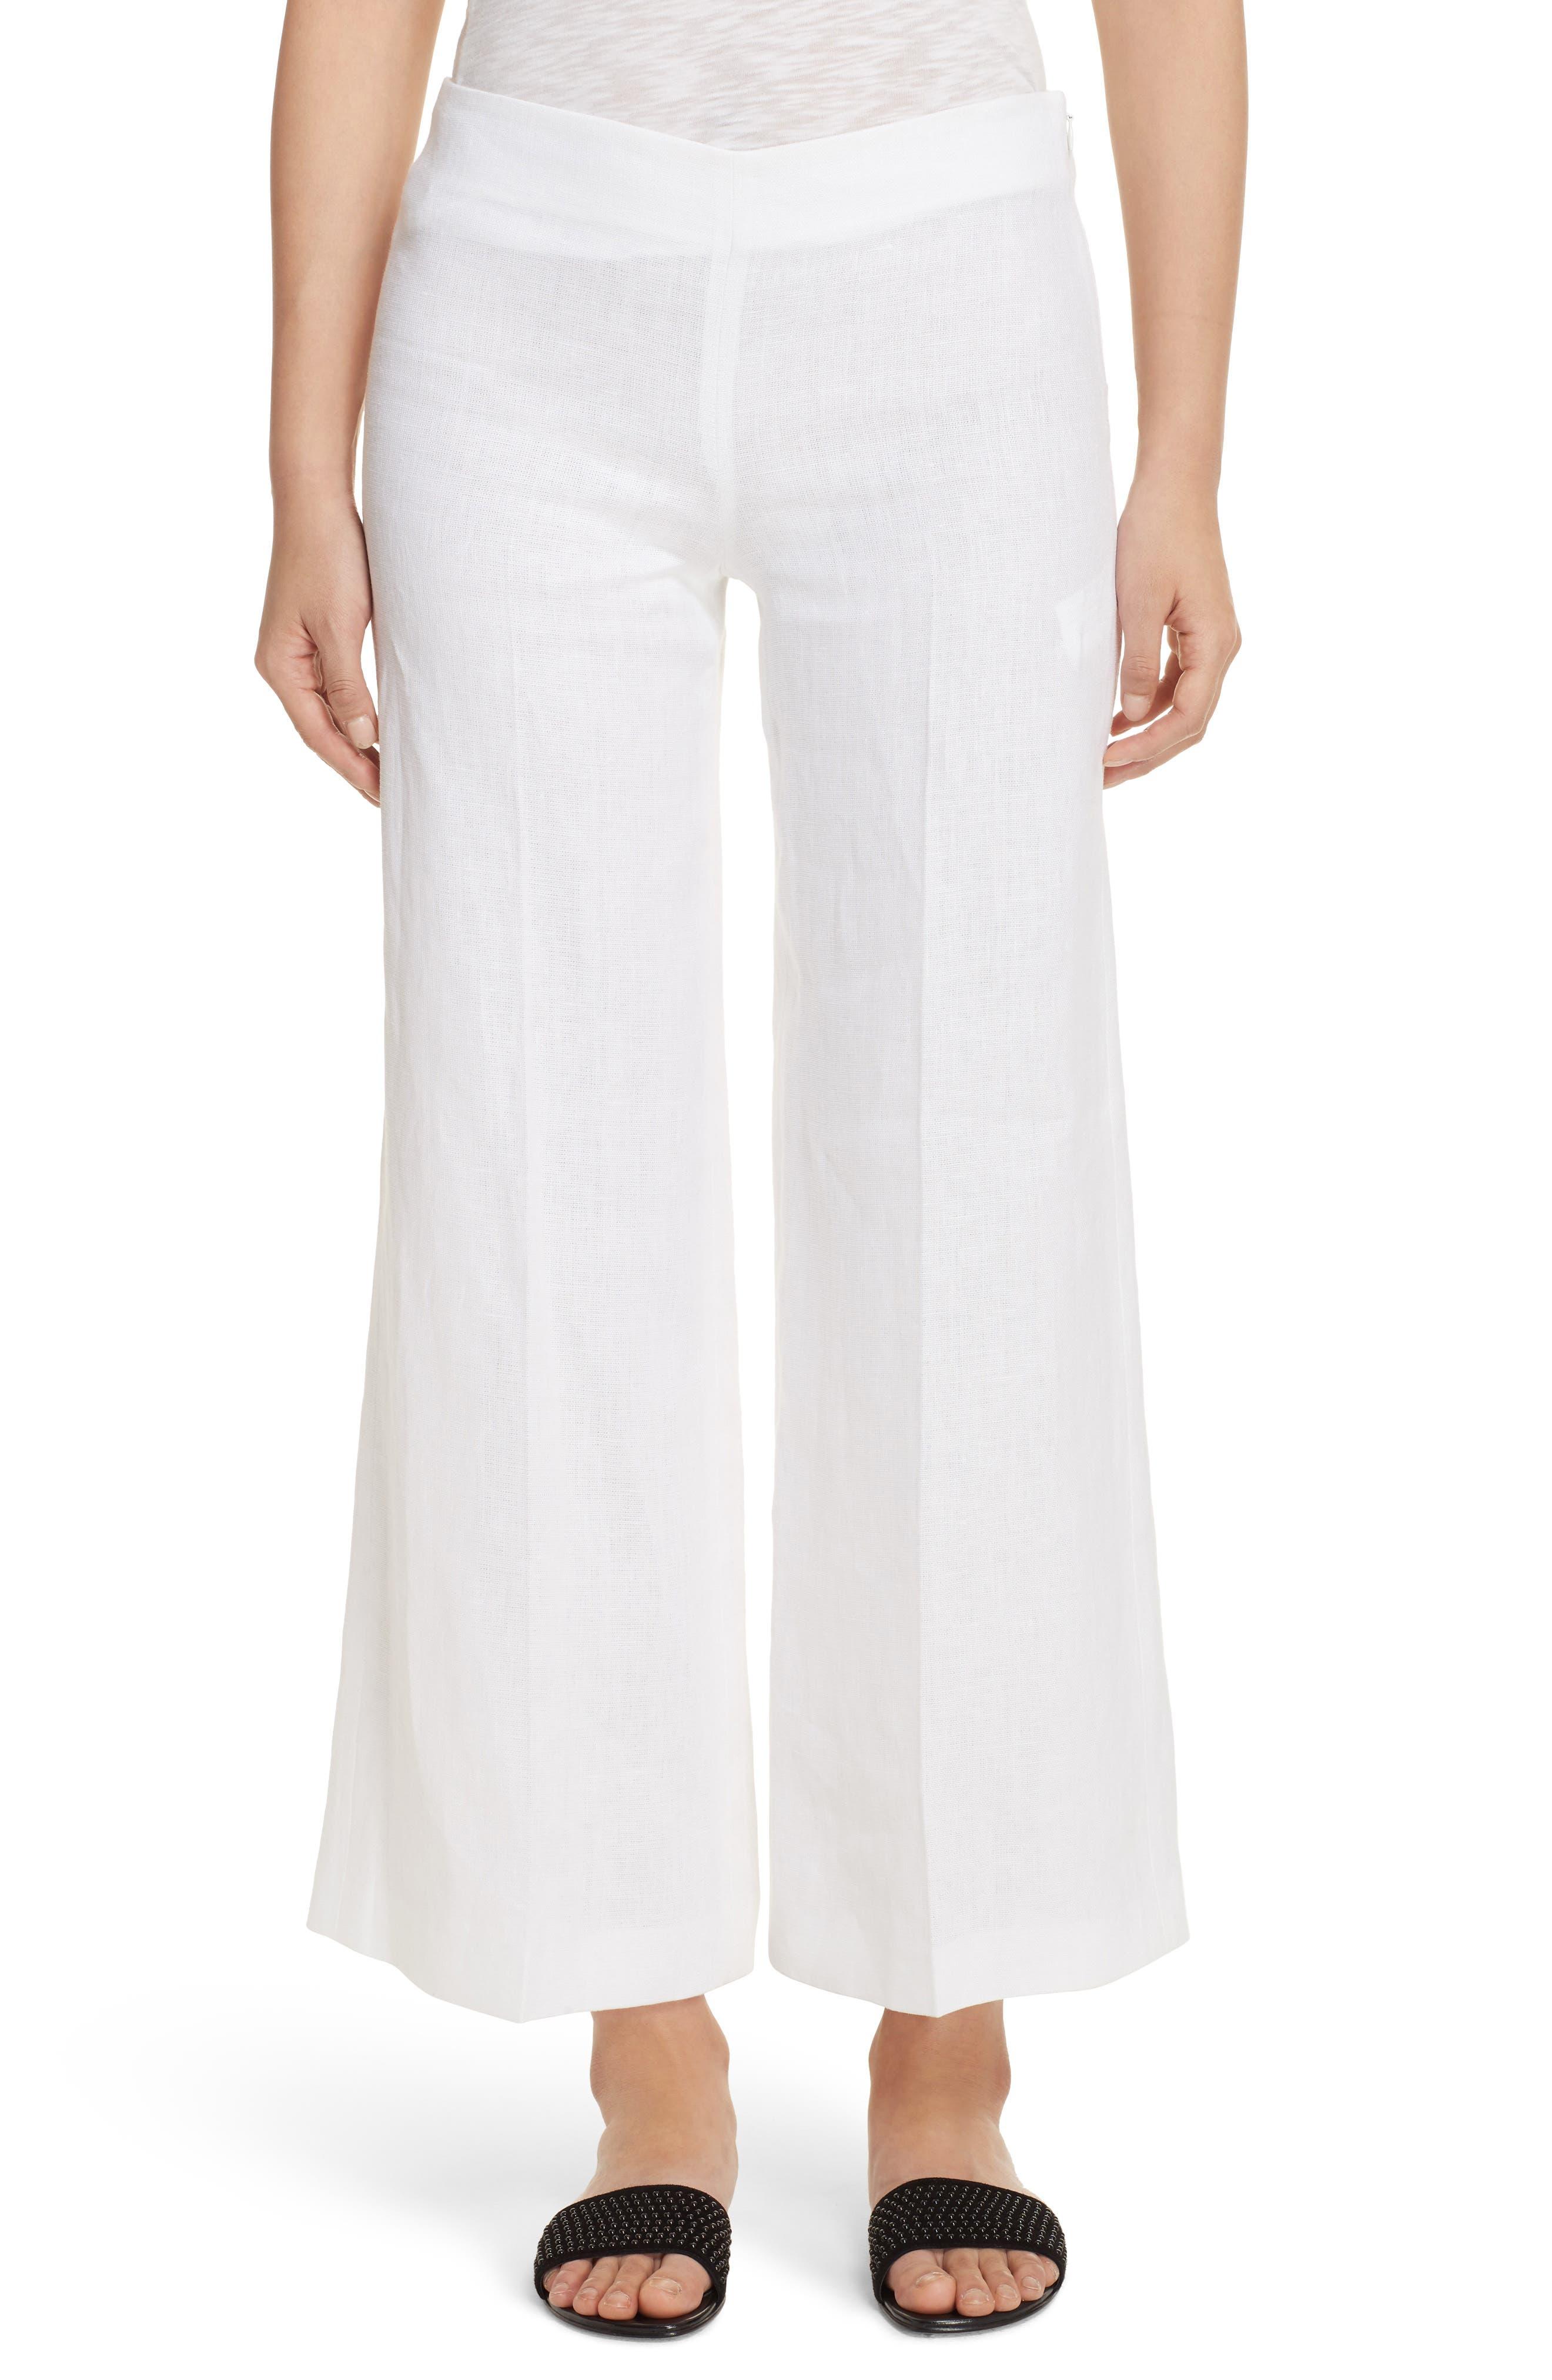 Terena B Linen Wide Leg Pants,                         Main,                         color, White